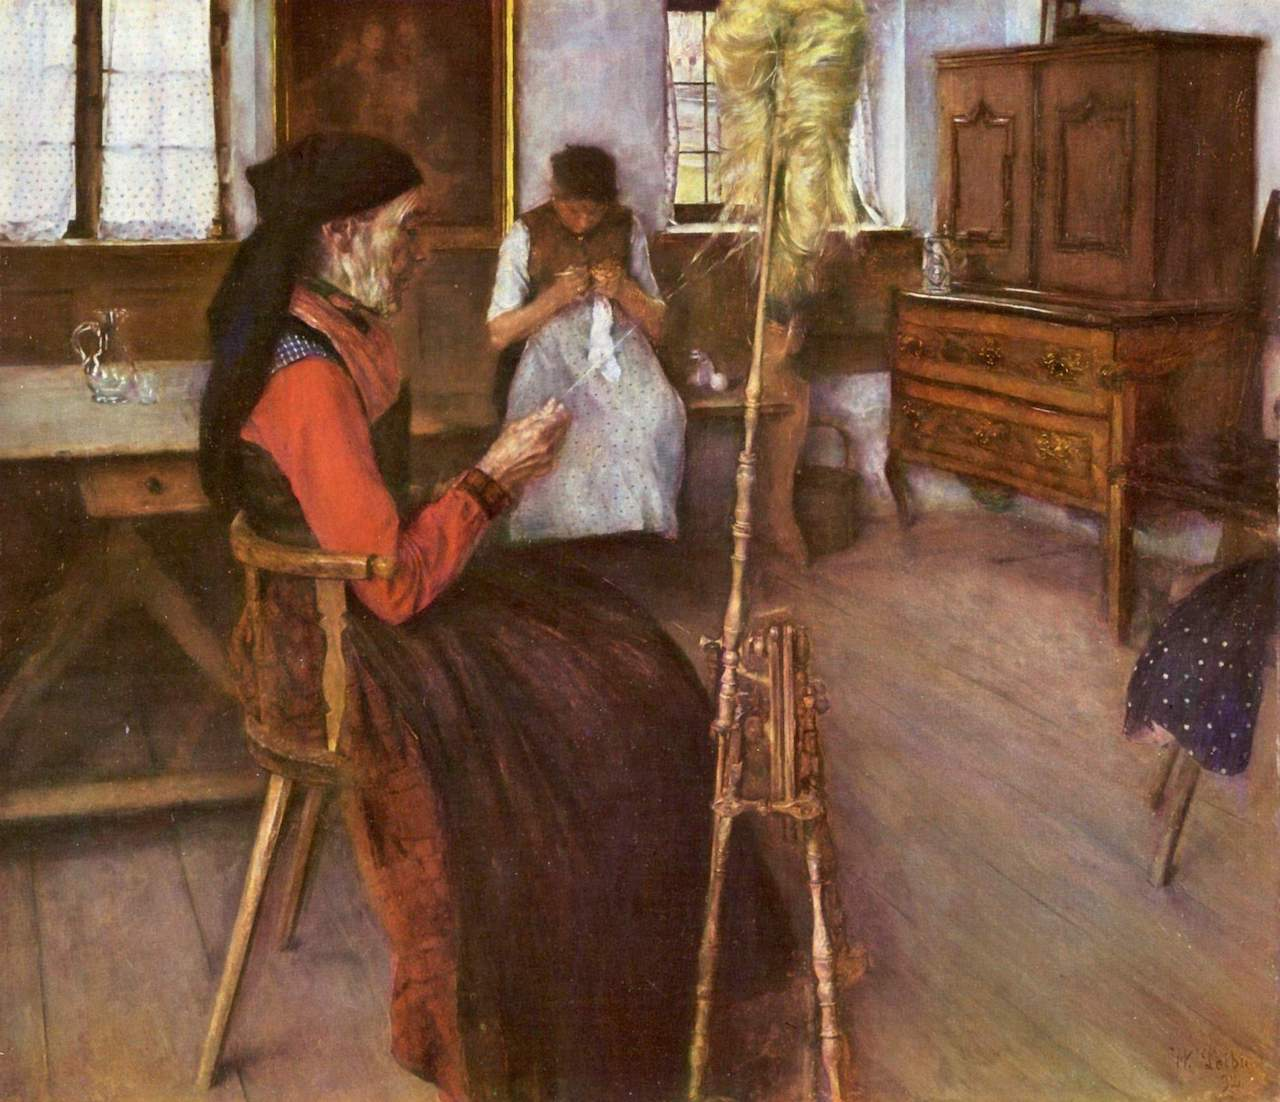 Wilhelm Leibl. Die Spinnerin. 1892. Öl / Leinwand. 65 x 74cm